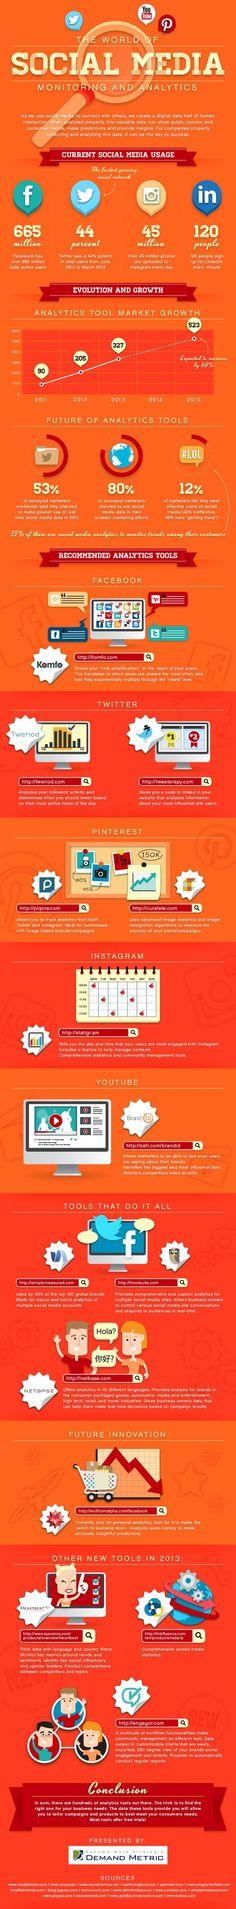 The World Of Social Media Monitoring -14 Social Media Analytics Tools #infographic